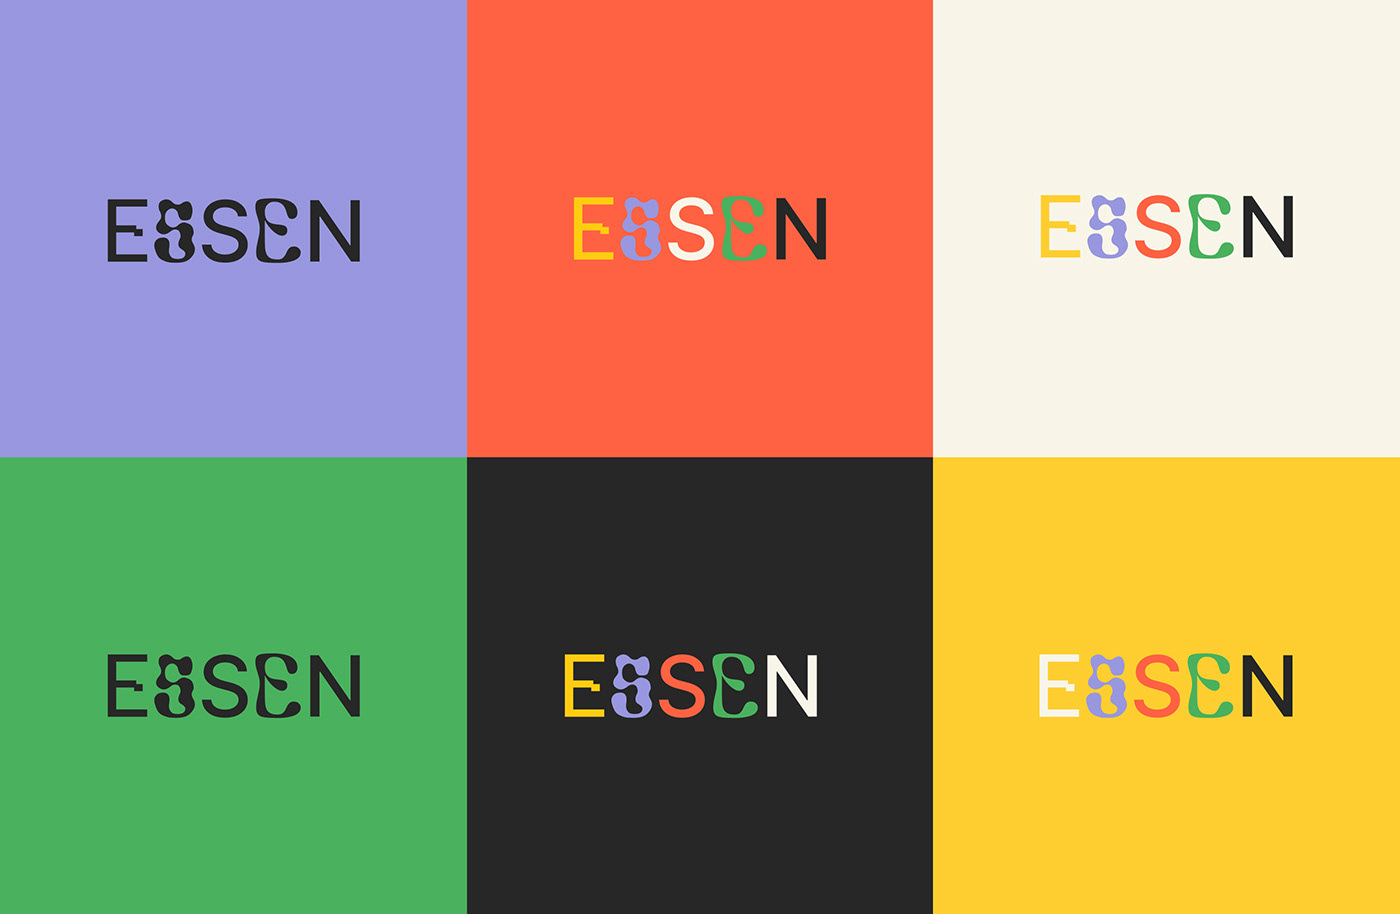 Advertising  branding  essen graphic system graphics identity poster typography   visual identity